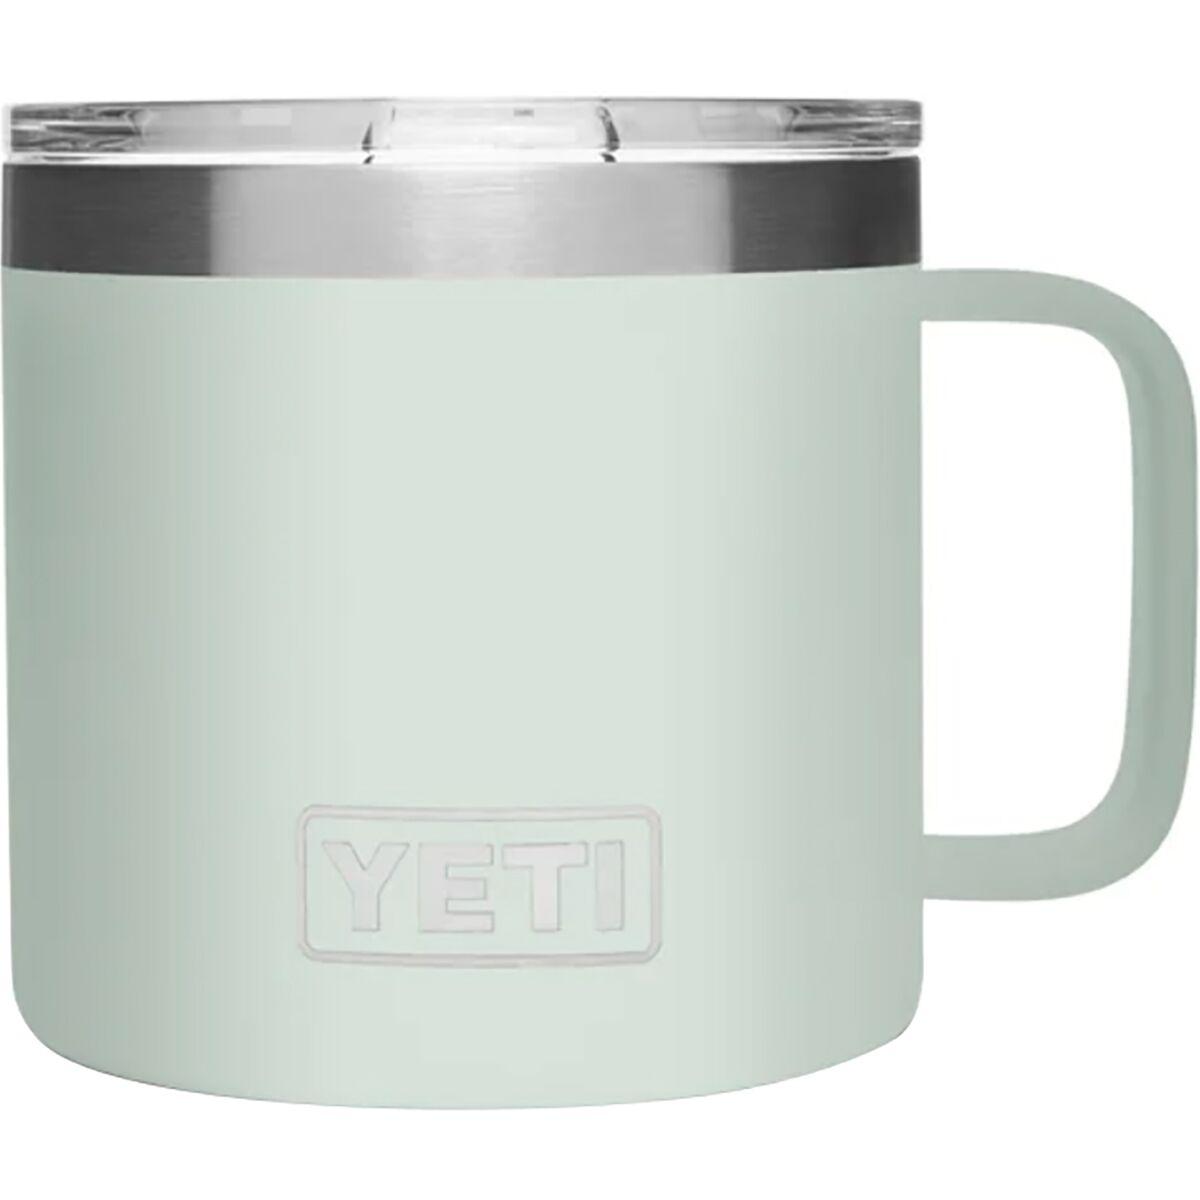 Yeti Rambler Mug 14oz Backcountry Com